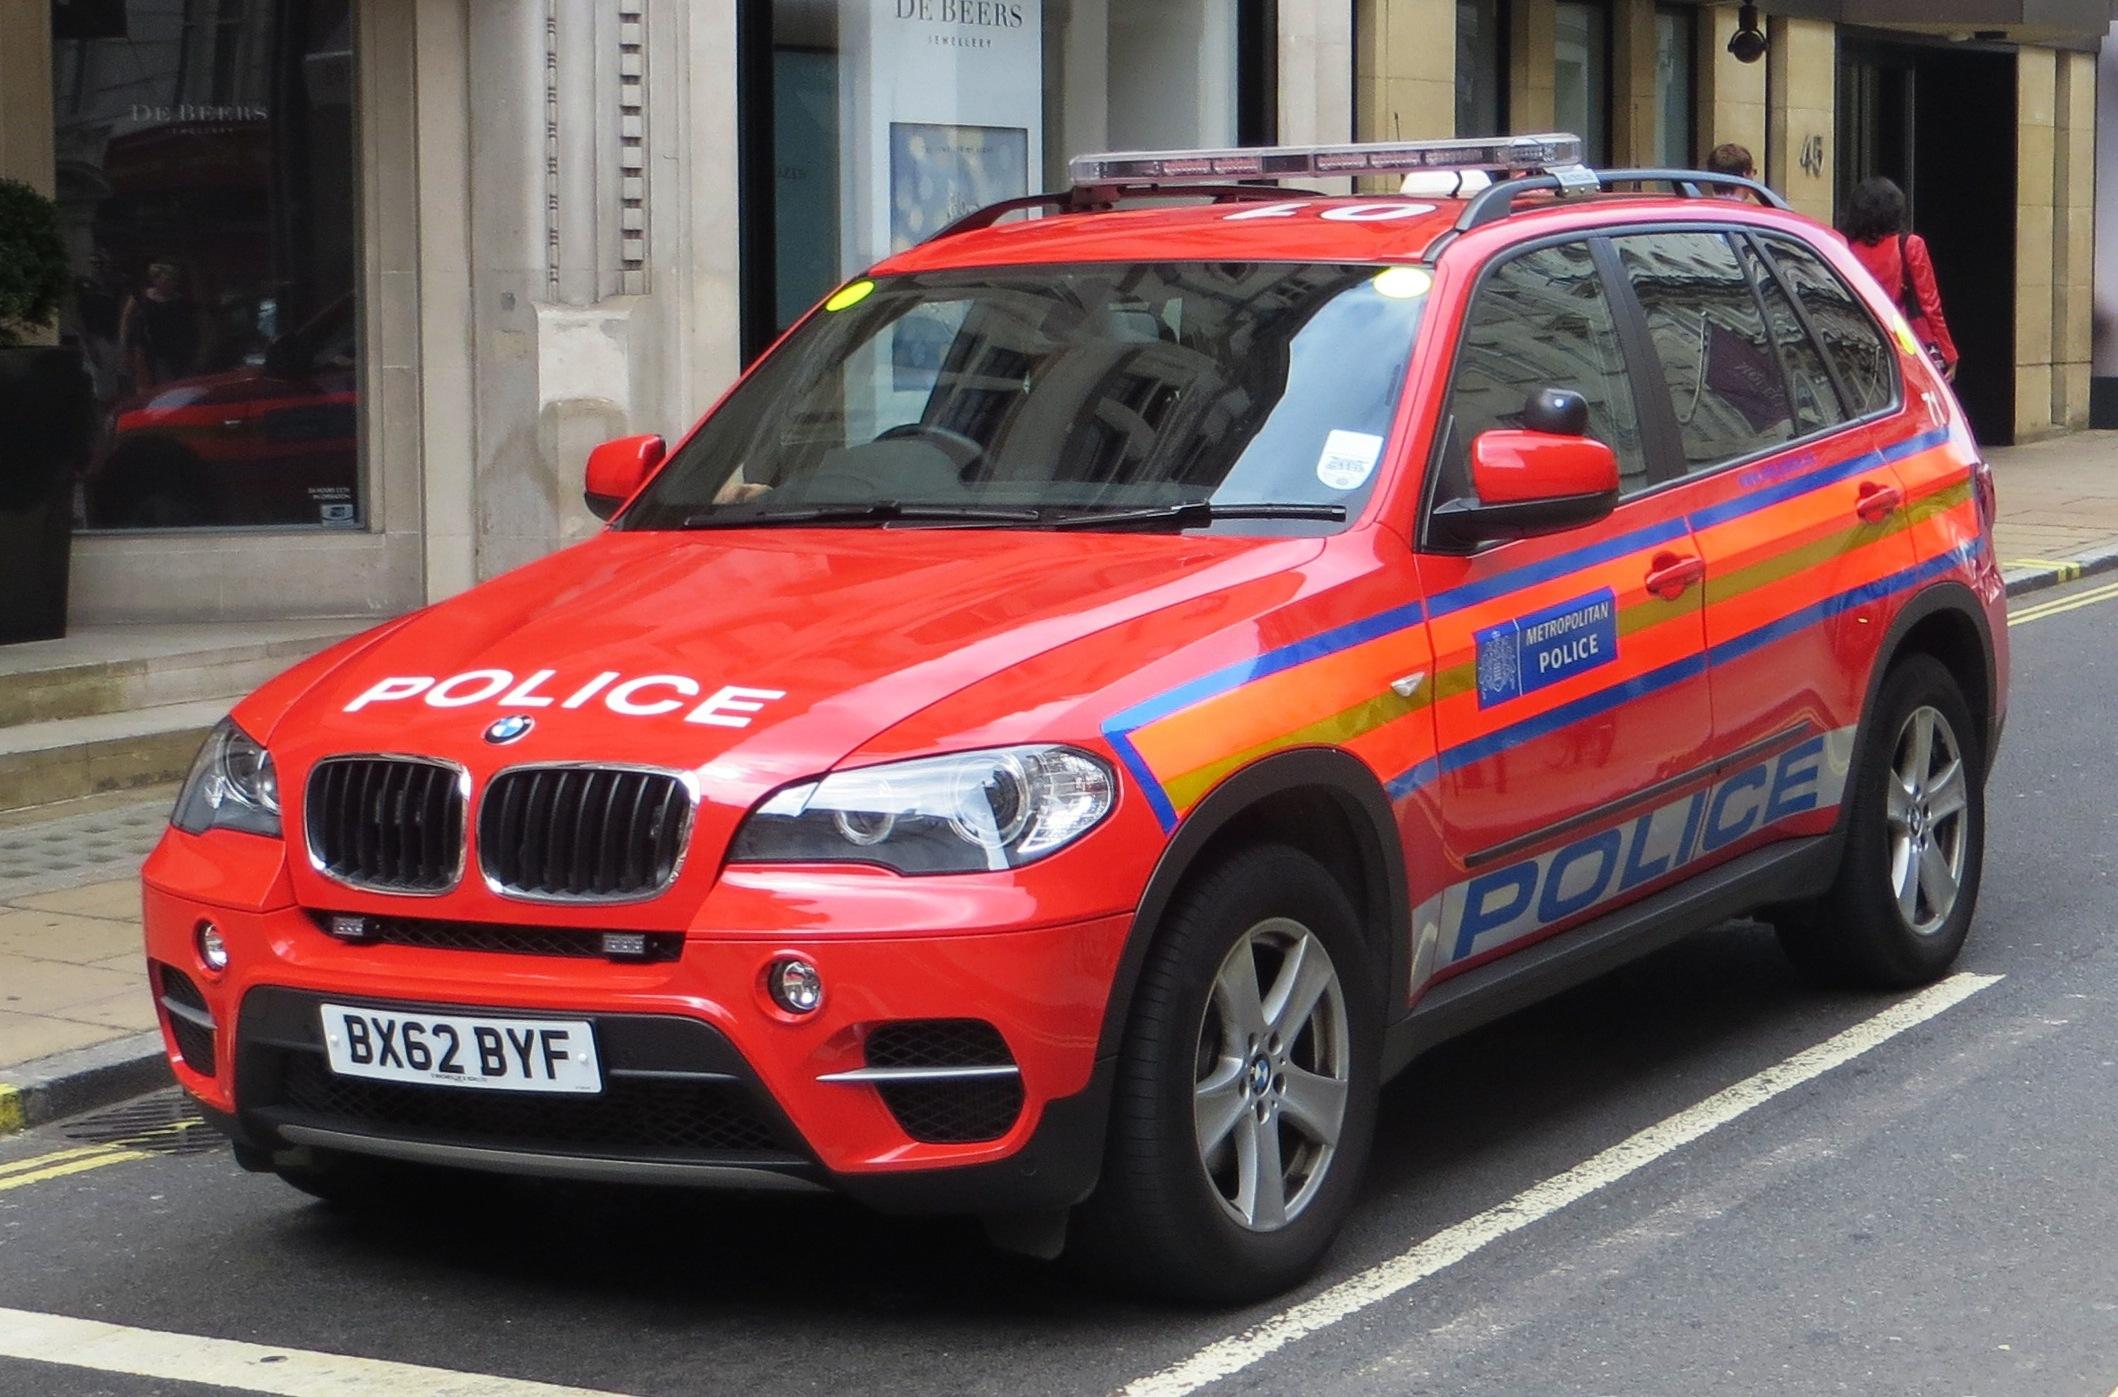 Police Cars For Sale Birmingham